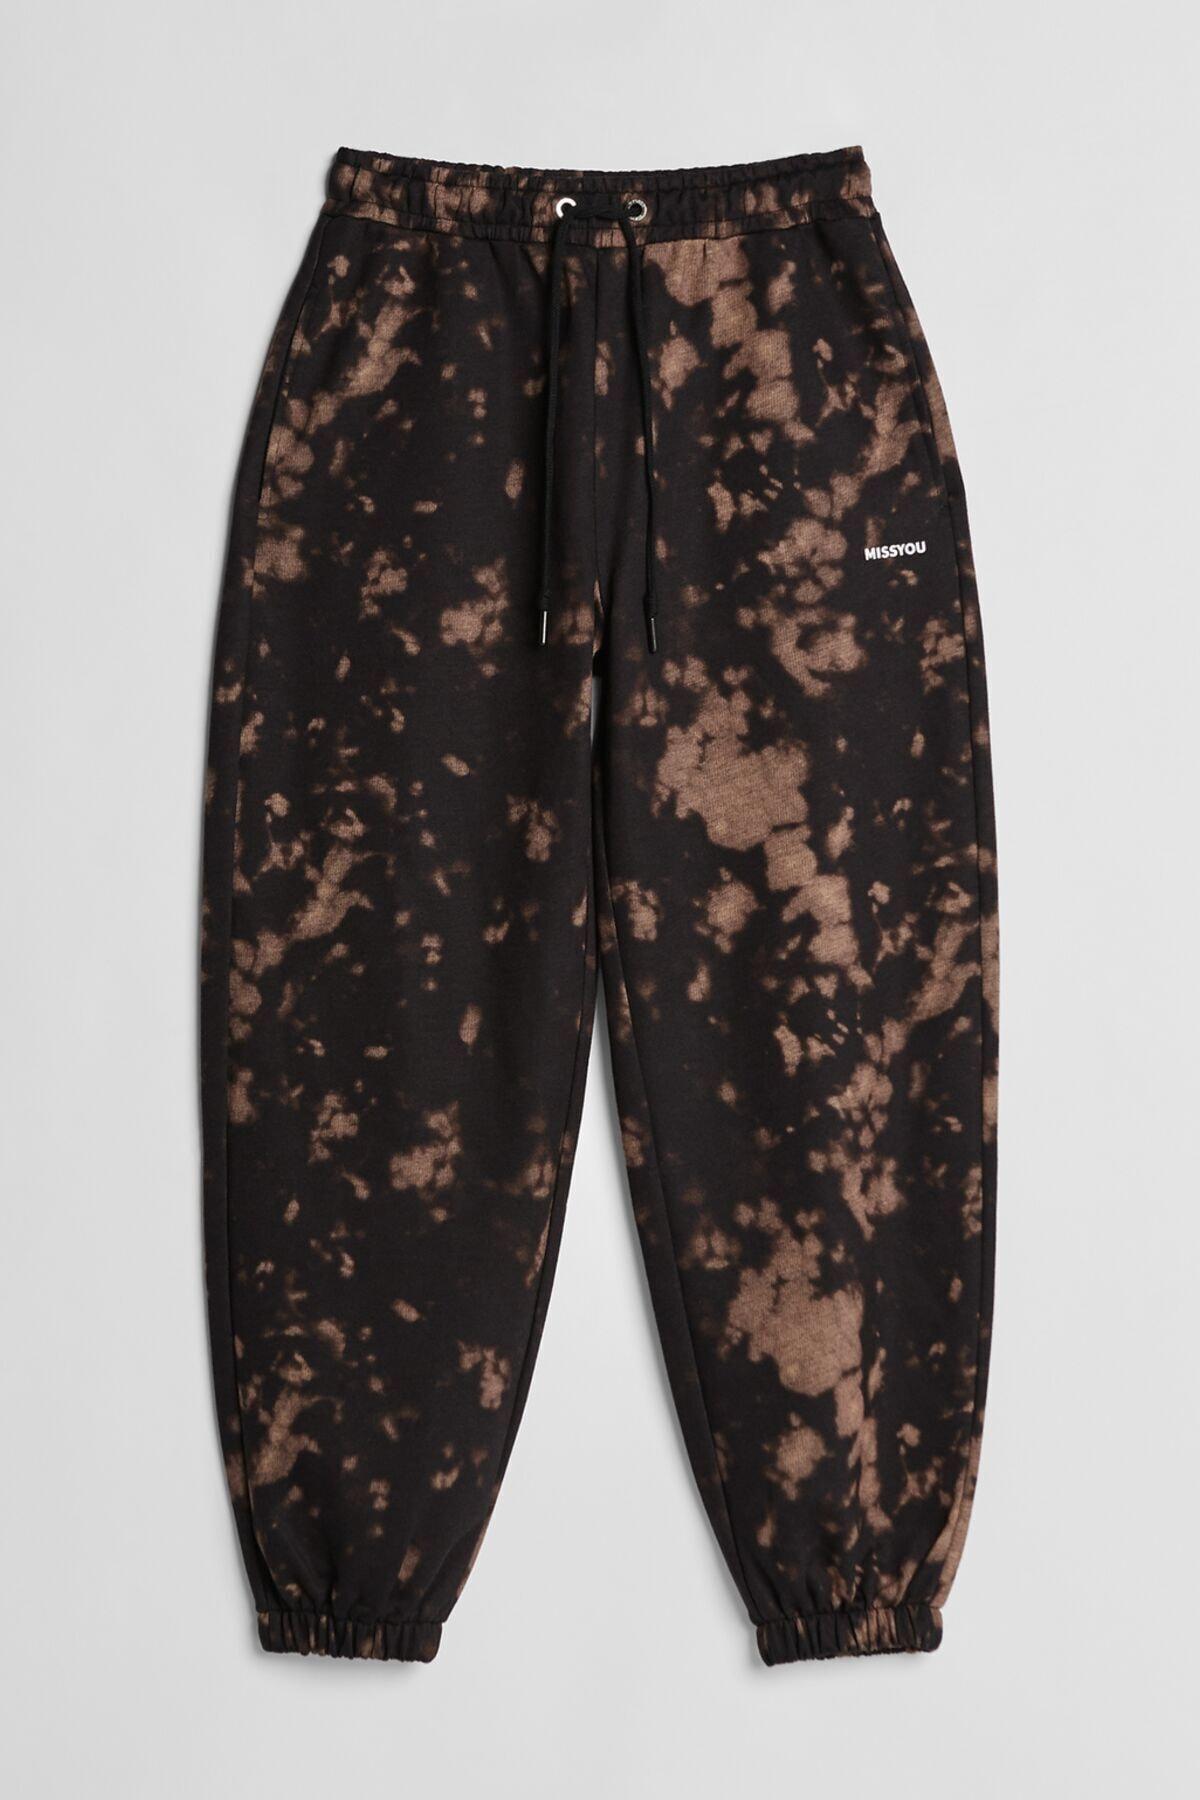 Bershka Batik Desenli Jogging Fit Pantolon 2